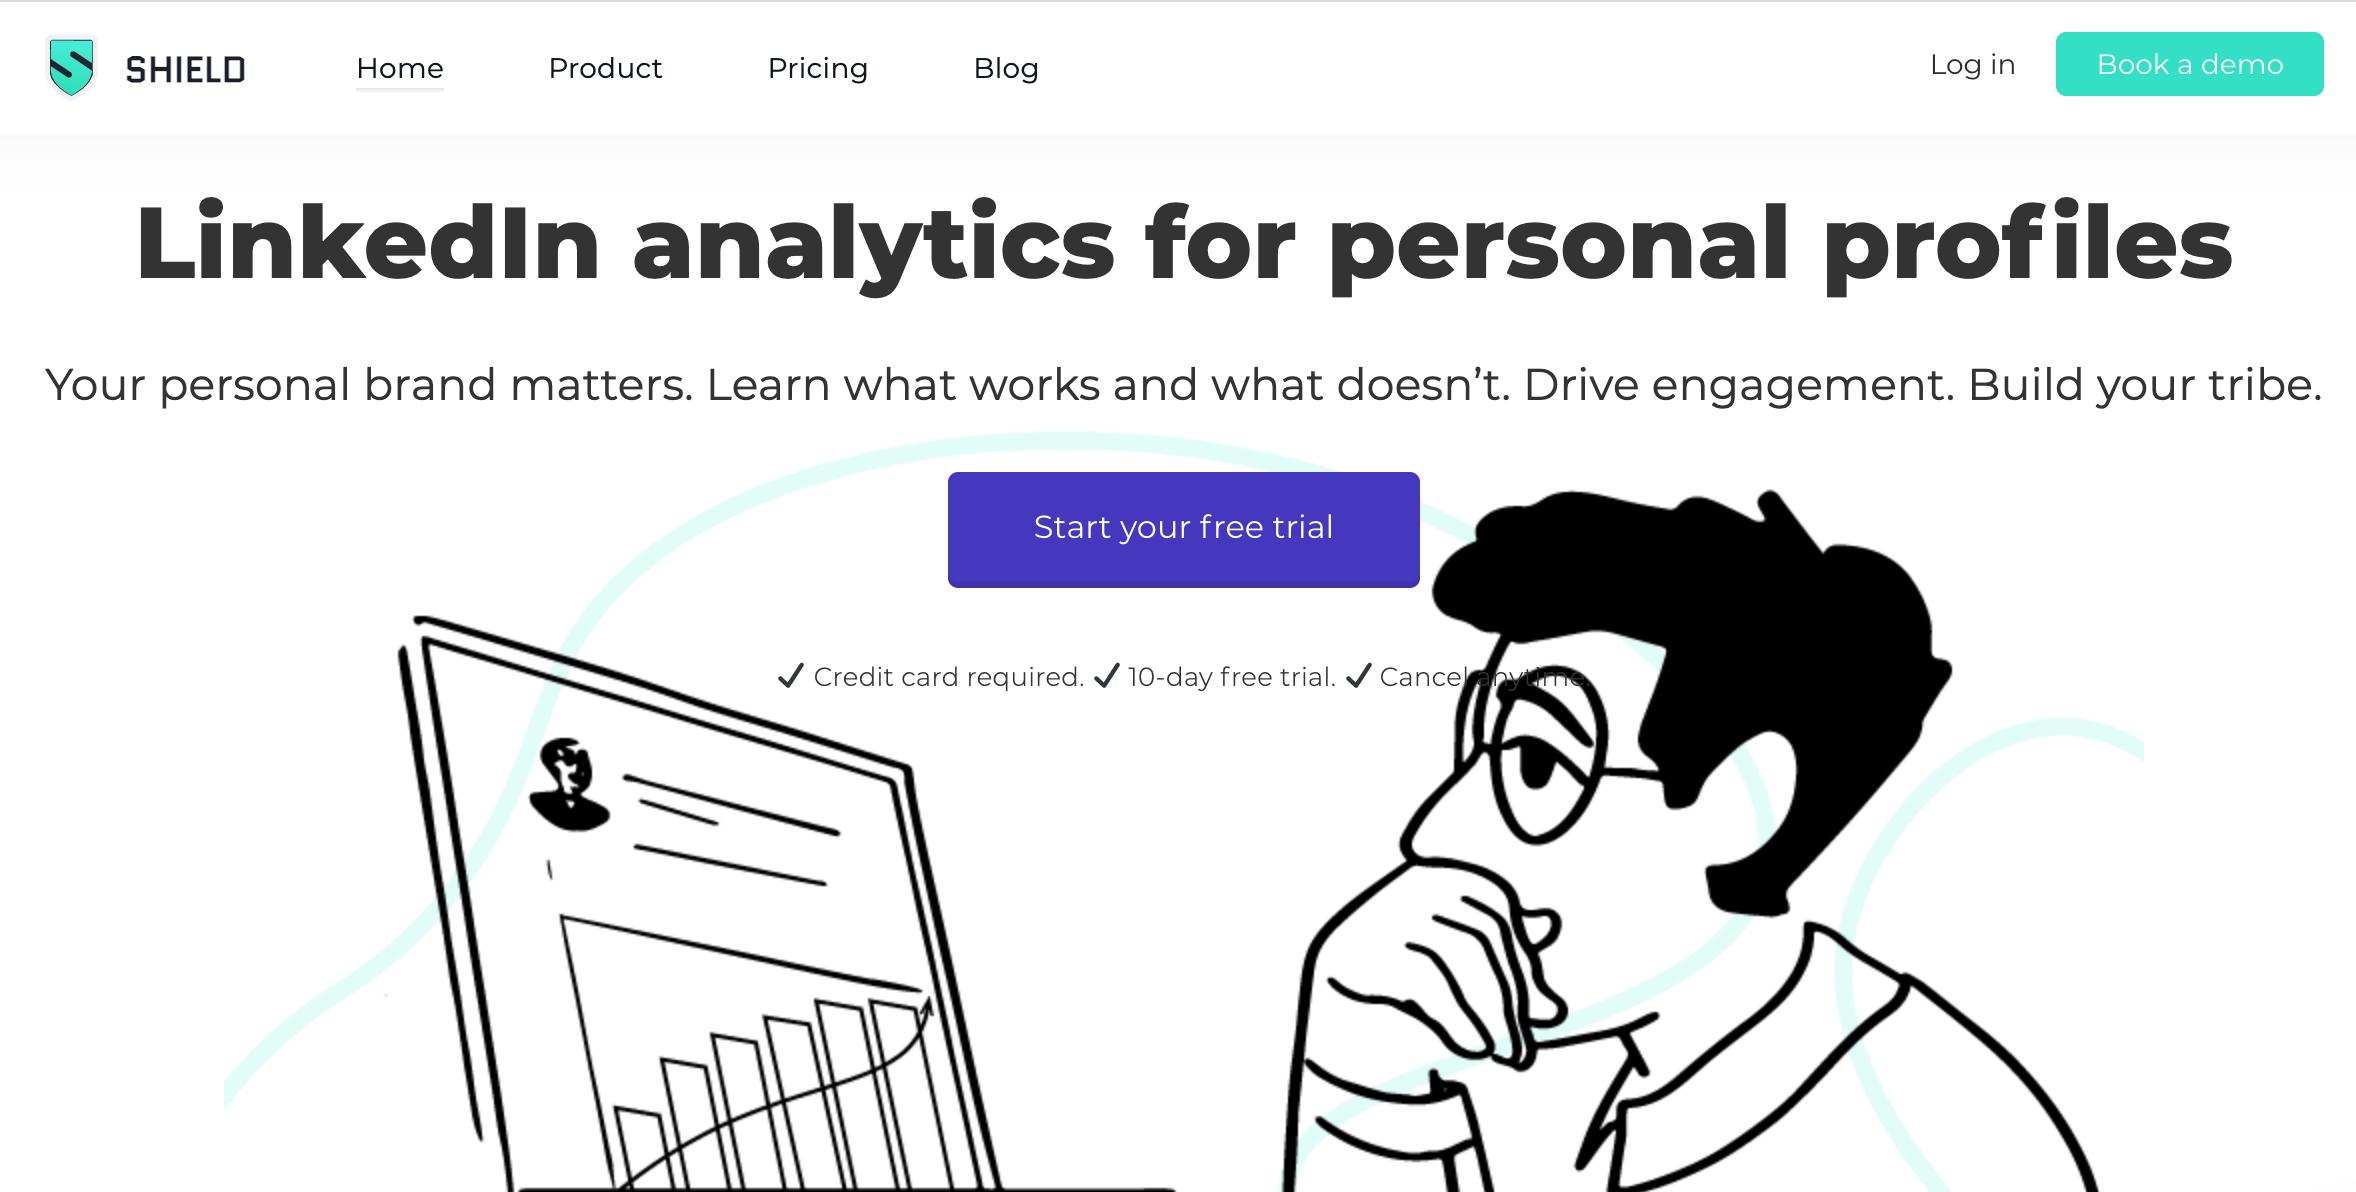 Shield App for LinkedIn analytics